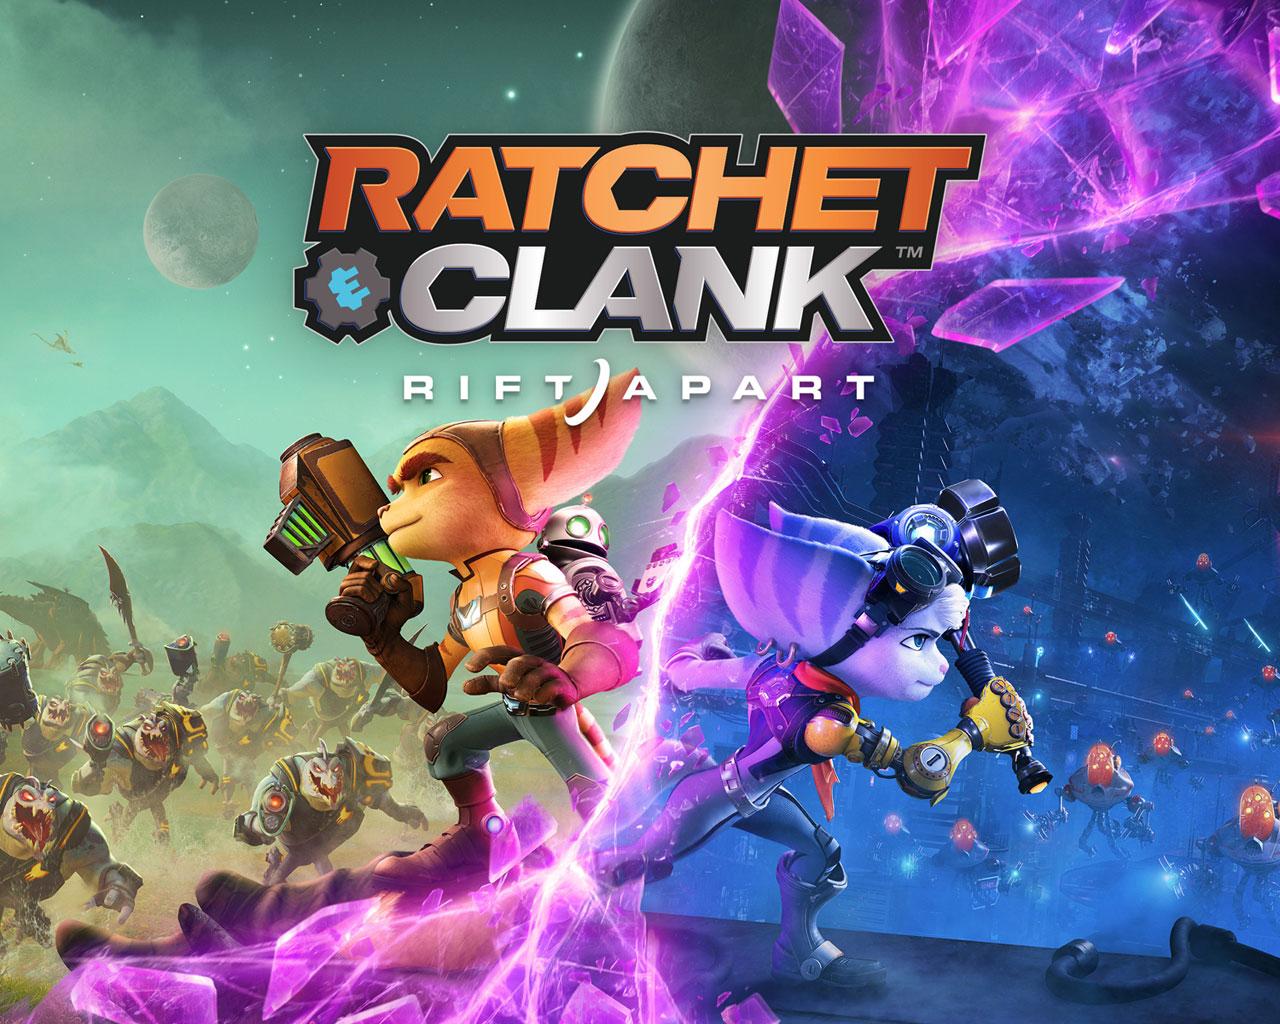 Free Ratchet & Clank: Rift Apart Wallpaper in 1280x1024